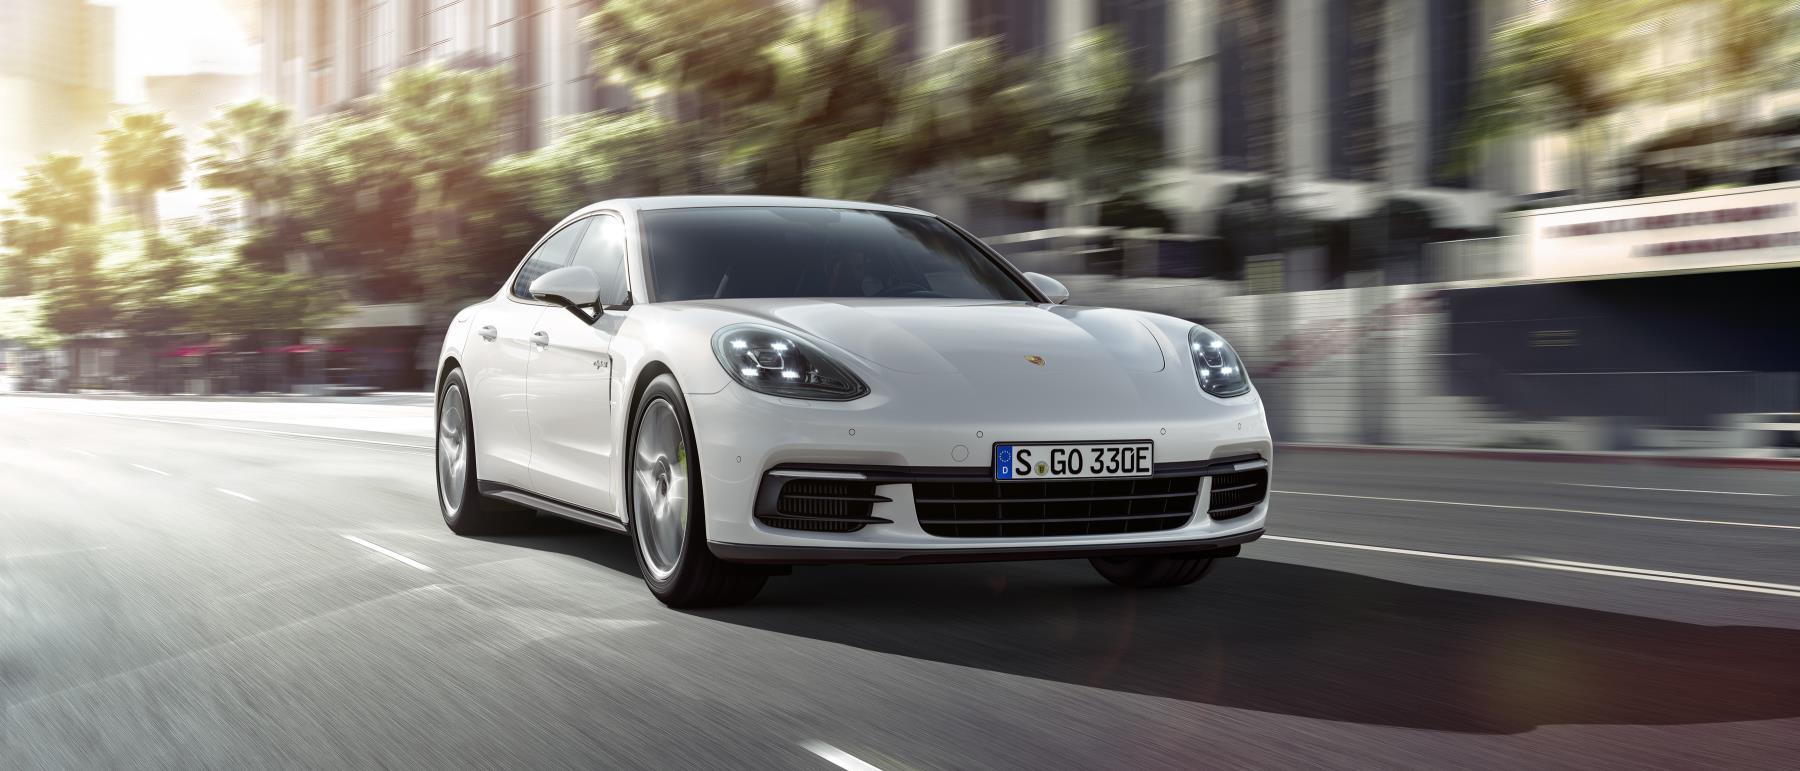 Porsche Panamera E-Hybrid sẽ ra mắt tại Paris Motor Show 2016 - 2